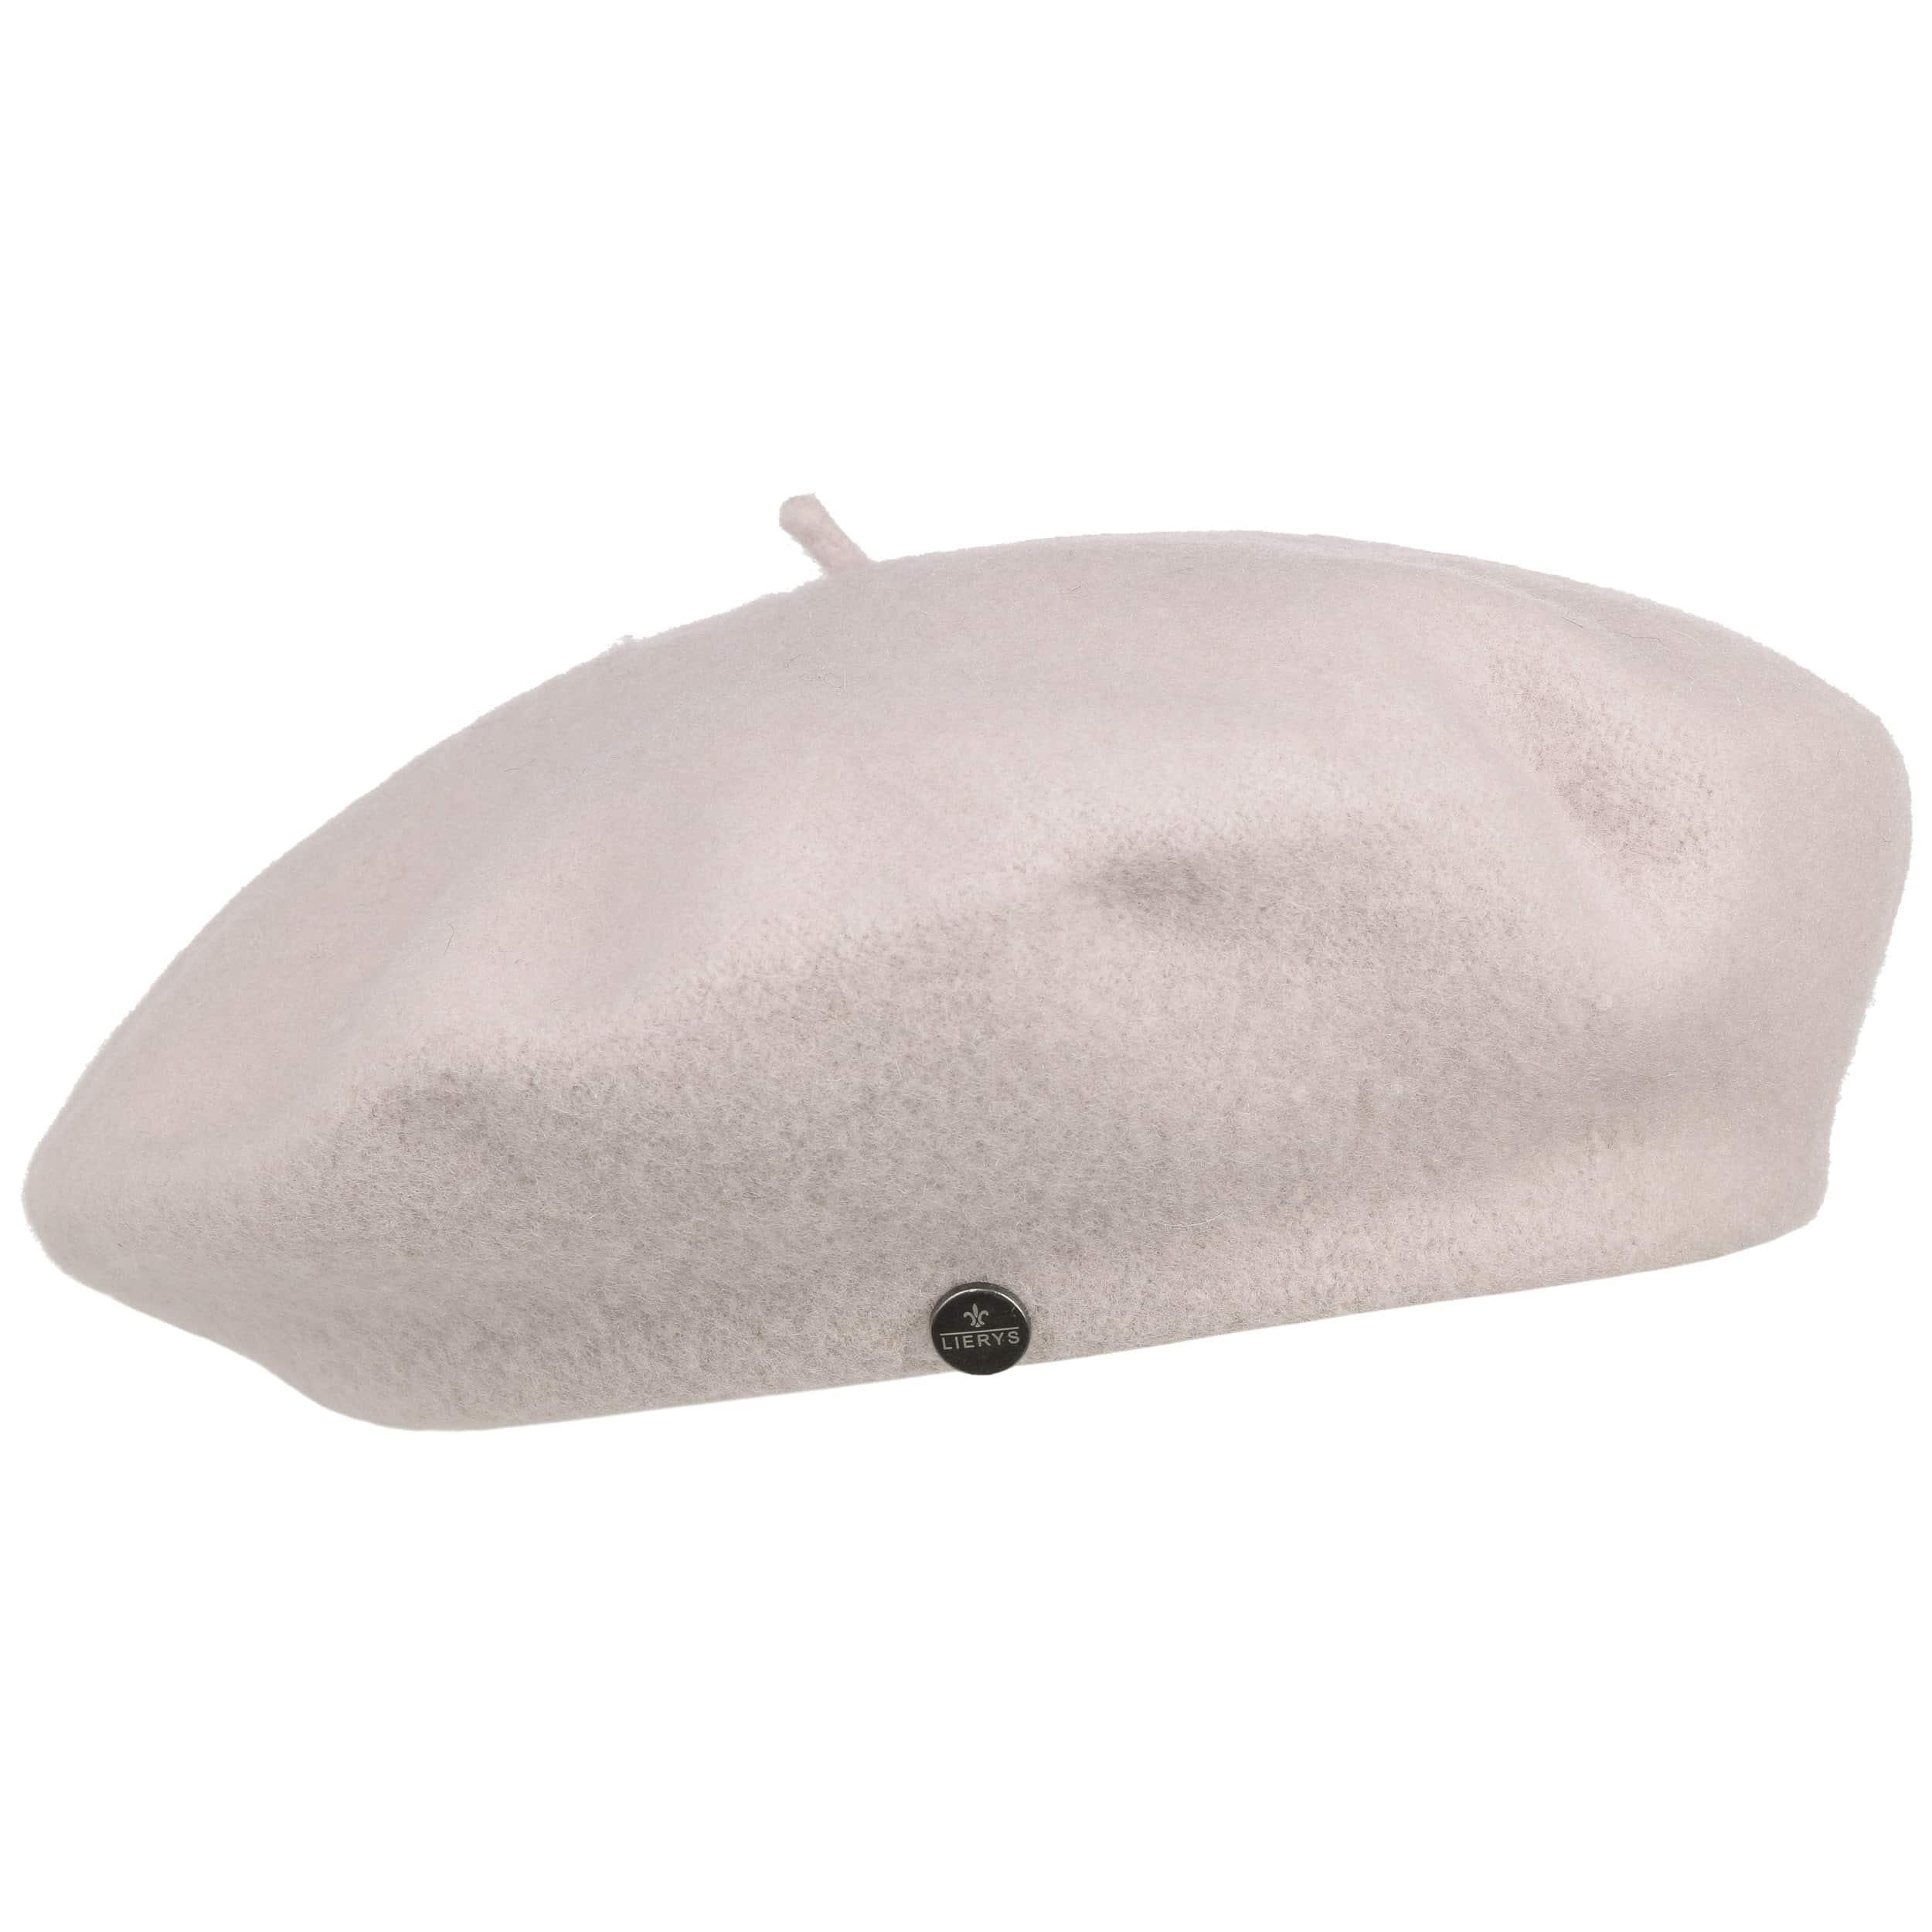 Boina de Mujer by Lierys - Gorros - sombreroshop.es 8d1b03e3510